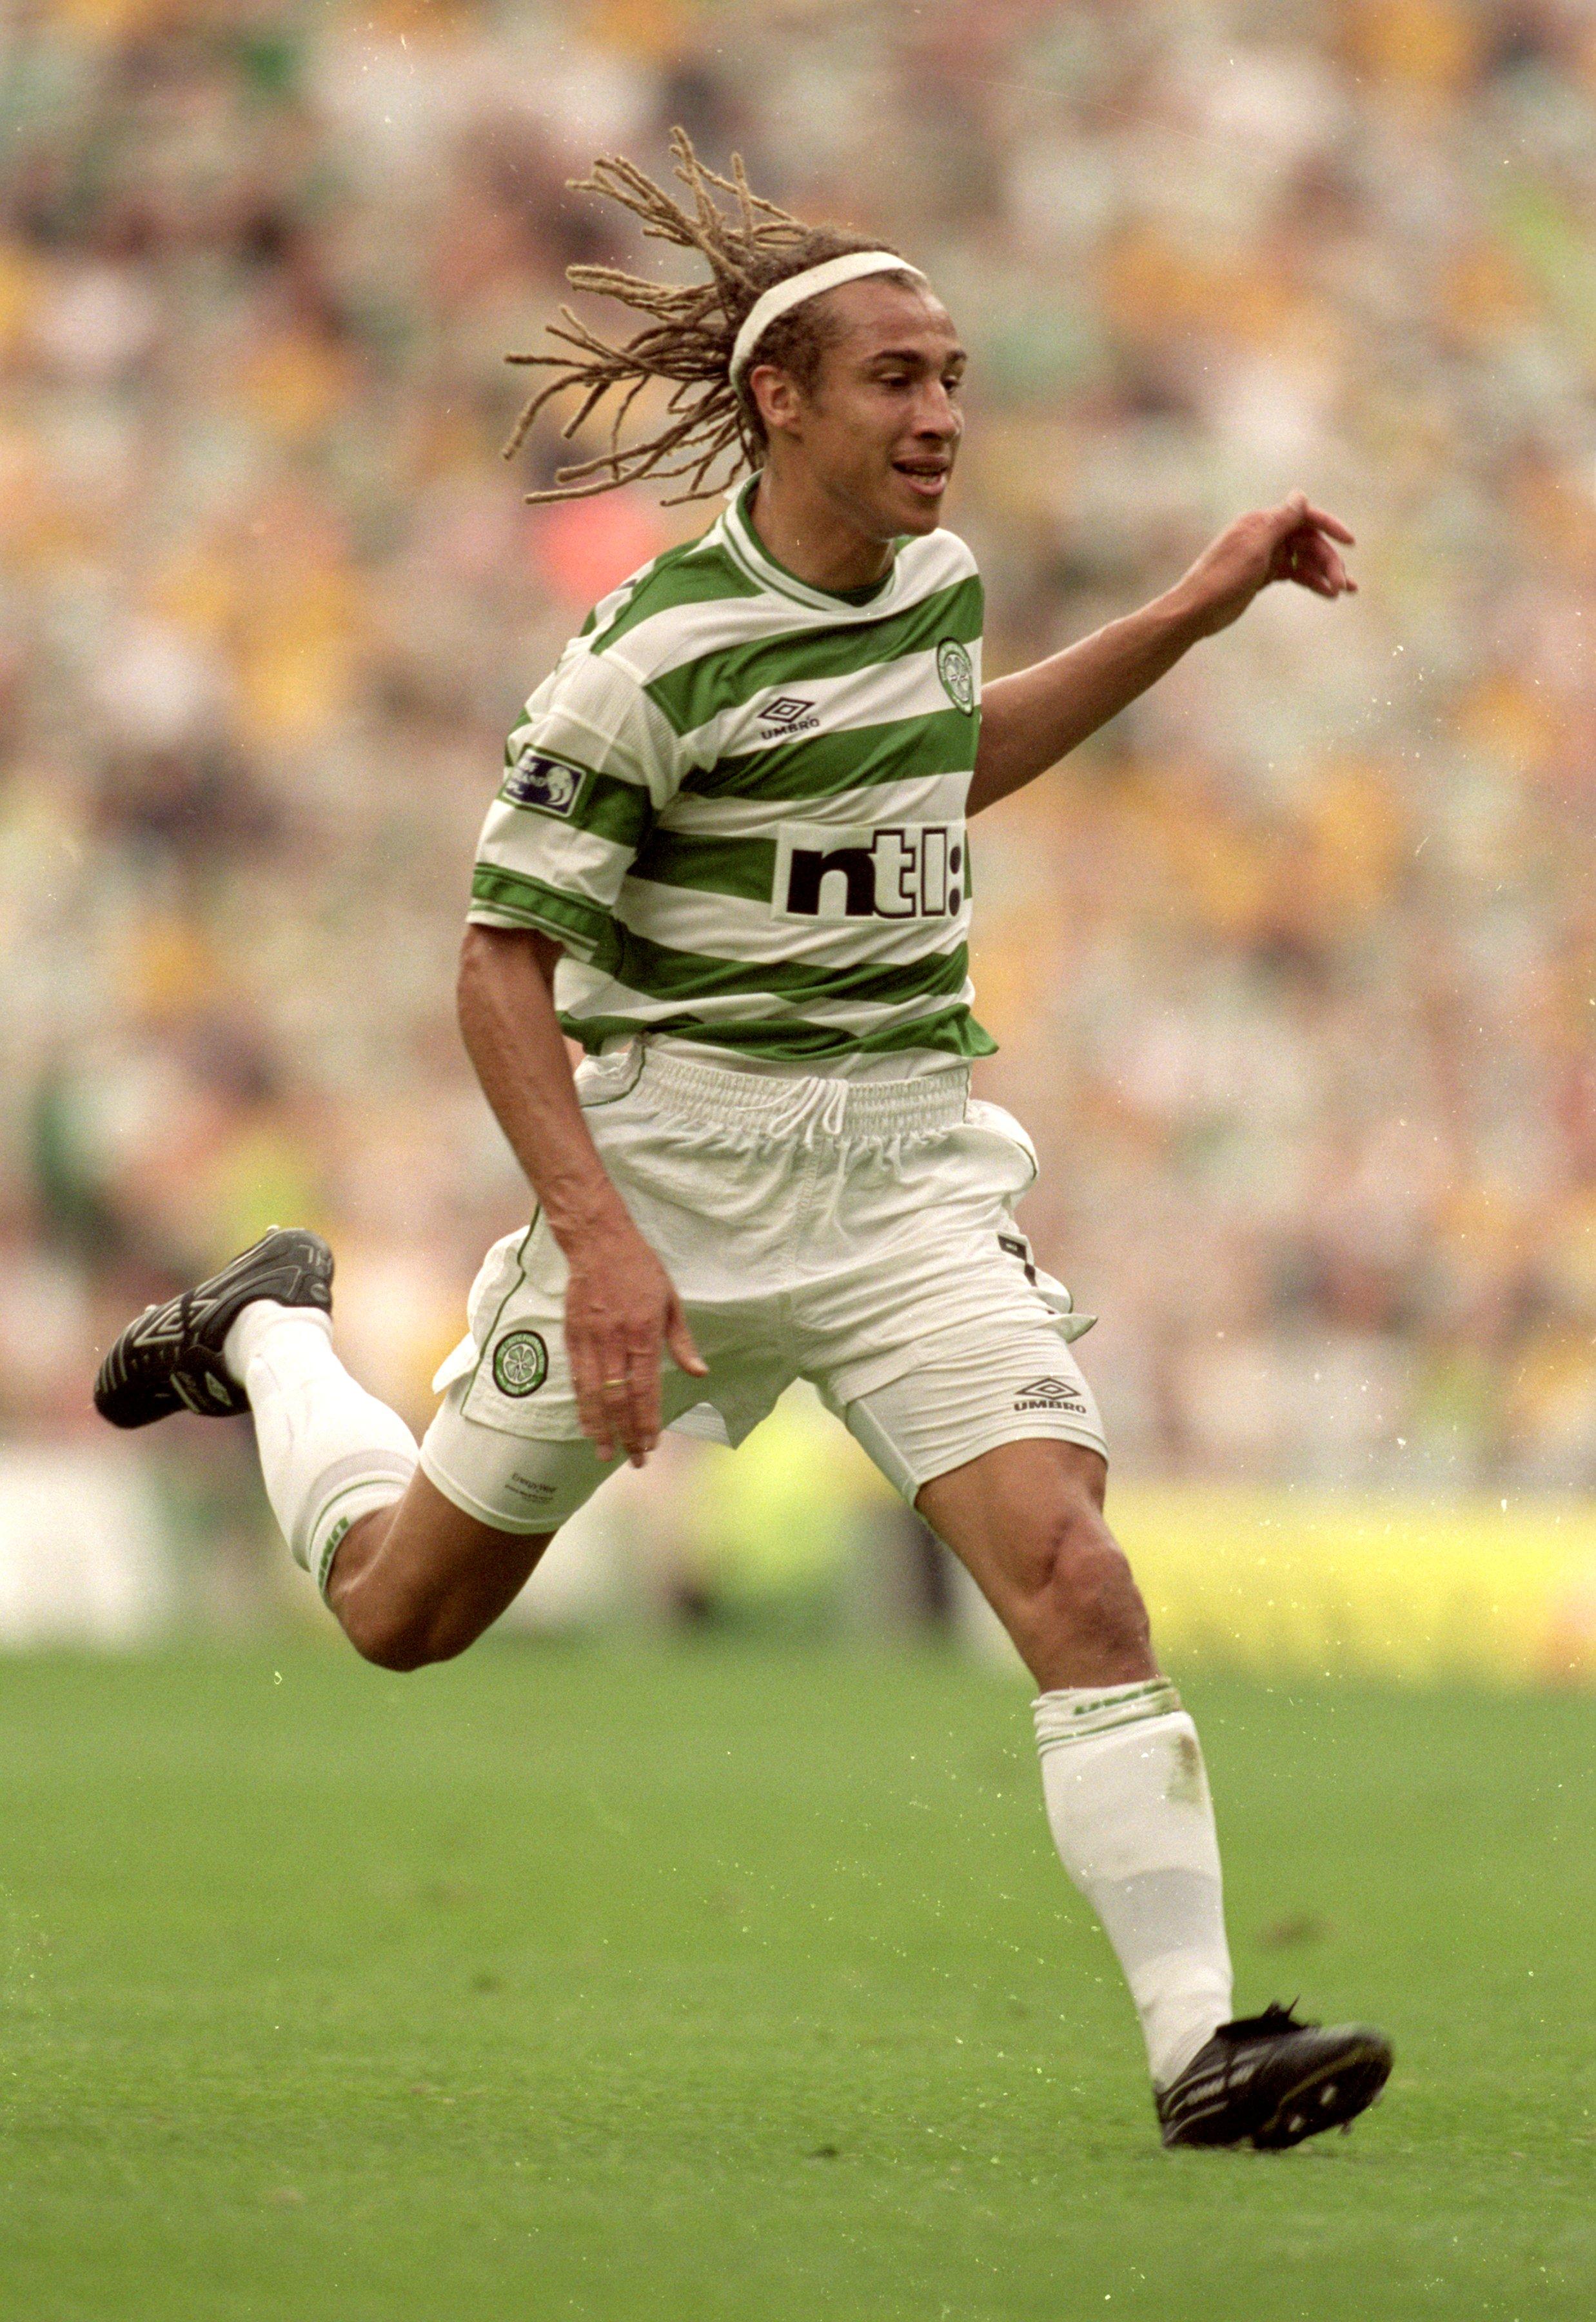 27 Aug 2000:  Henrik Larsson of Celtic during the Scottish Premier League match against Rangers at Celtic Park in Glasgow, Scotland. Celtic won the game 6 - 2. \ Mandatory Credit: Stu Forster /Allsport